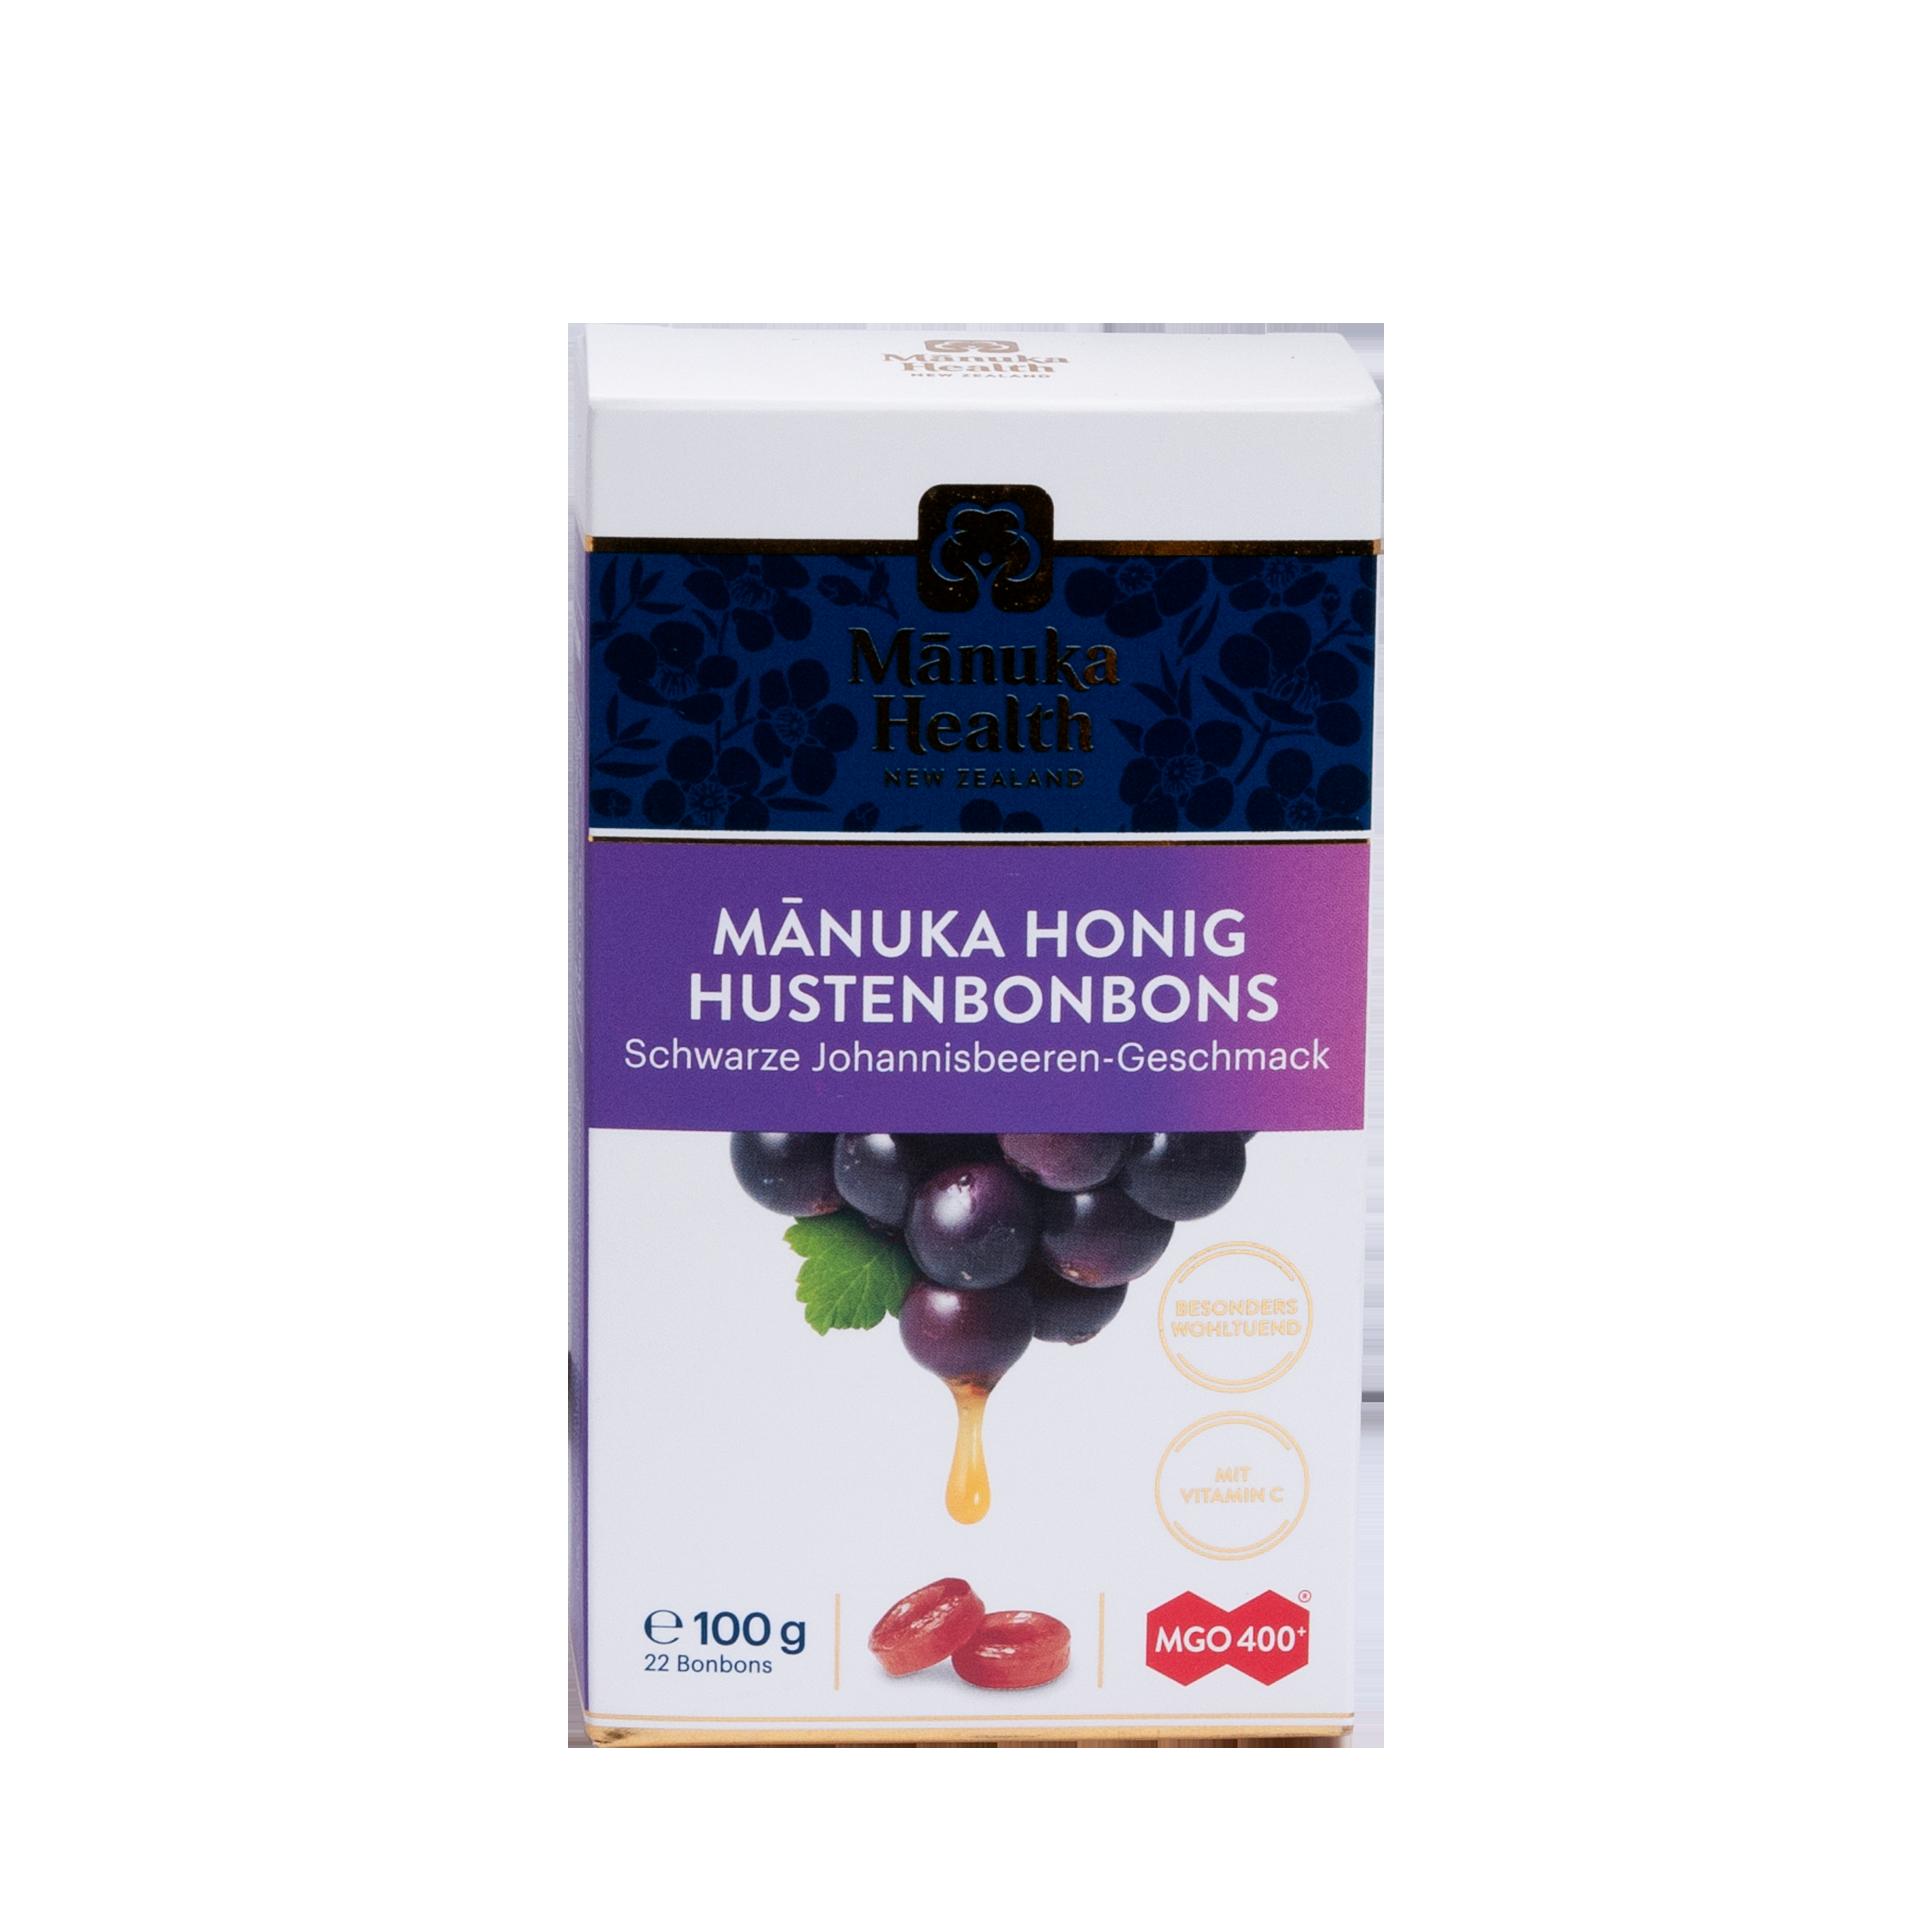 Manuka Honig Lutschbonbons, Schwarze Johannisbeere, 100 g